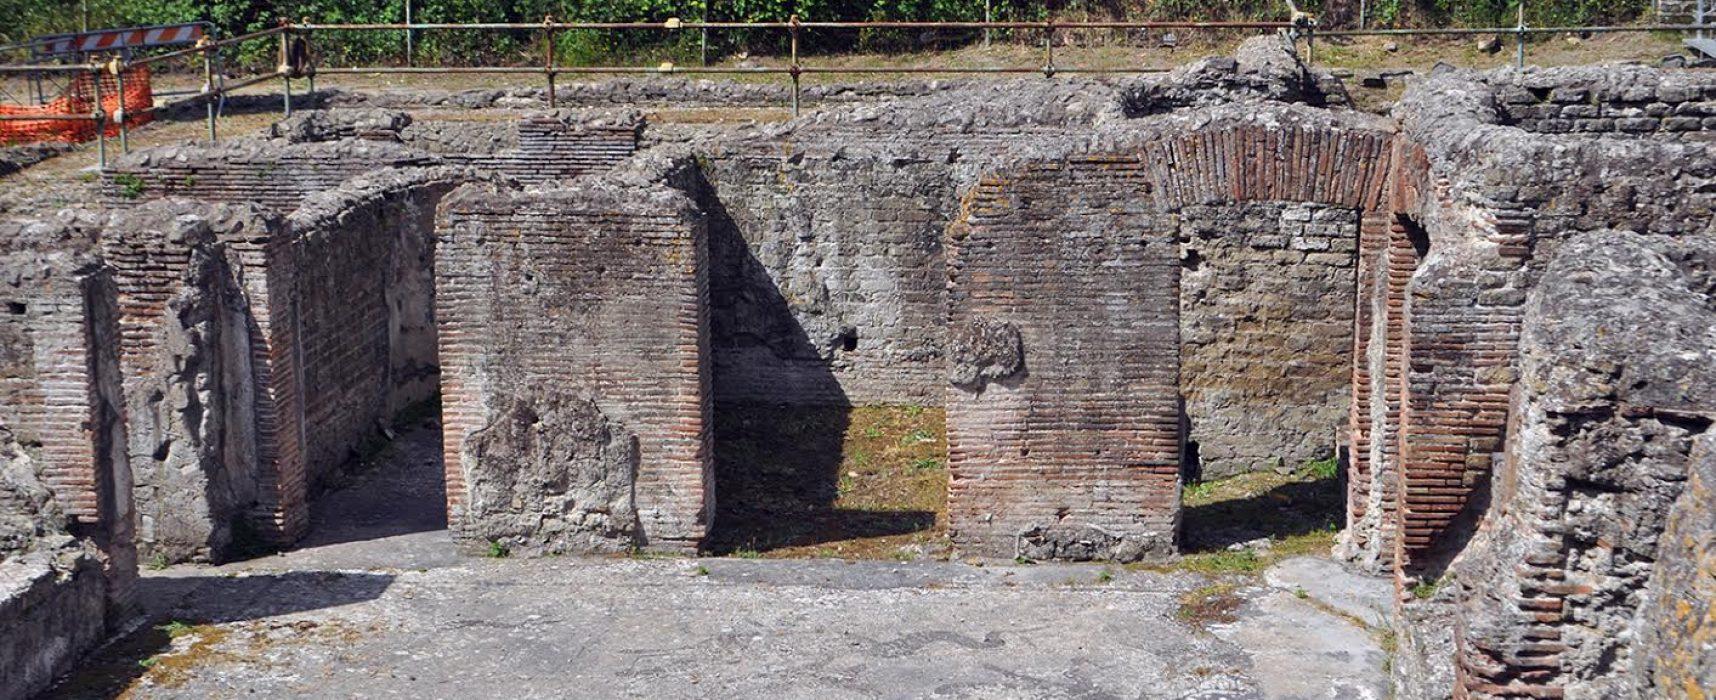 Terme via Terracina, al via visite guidate